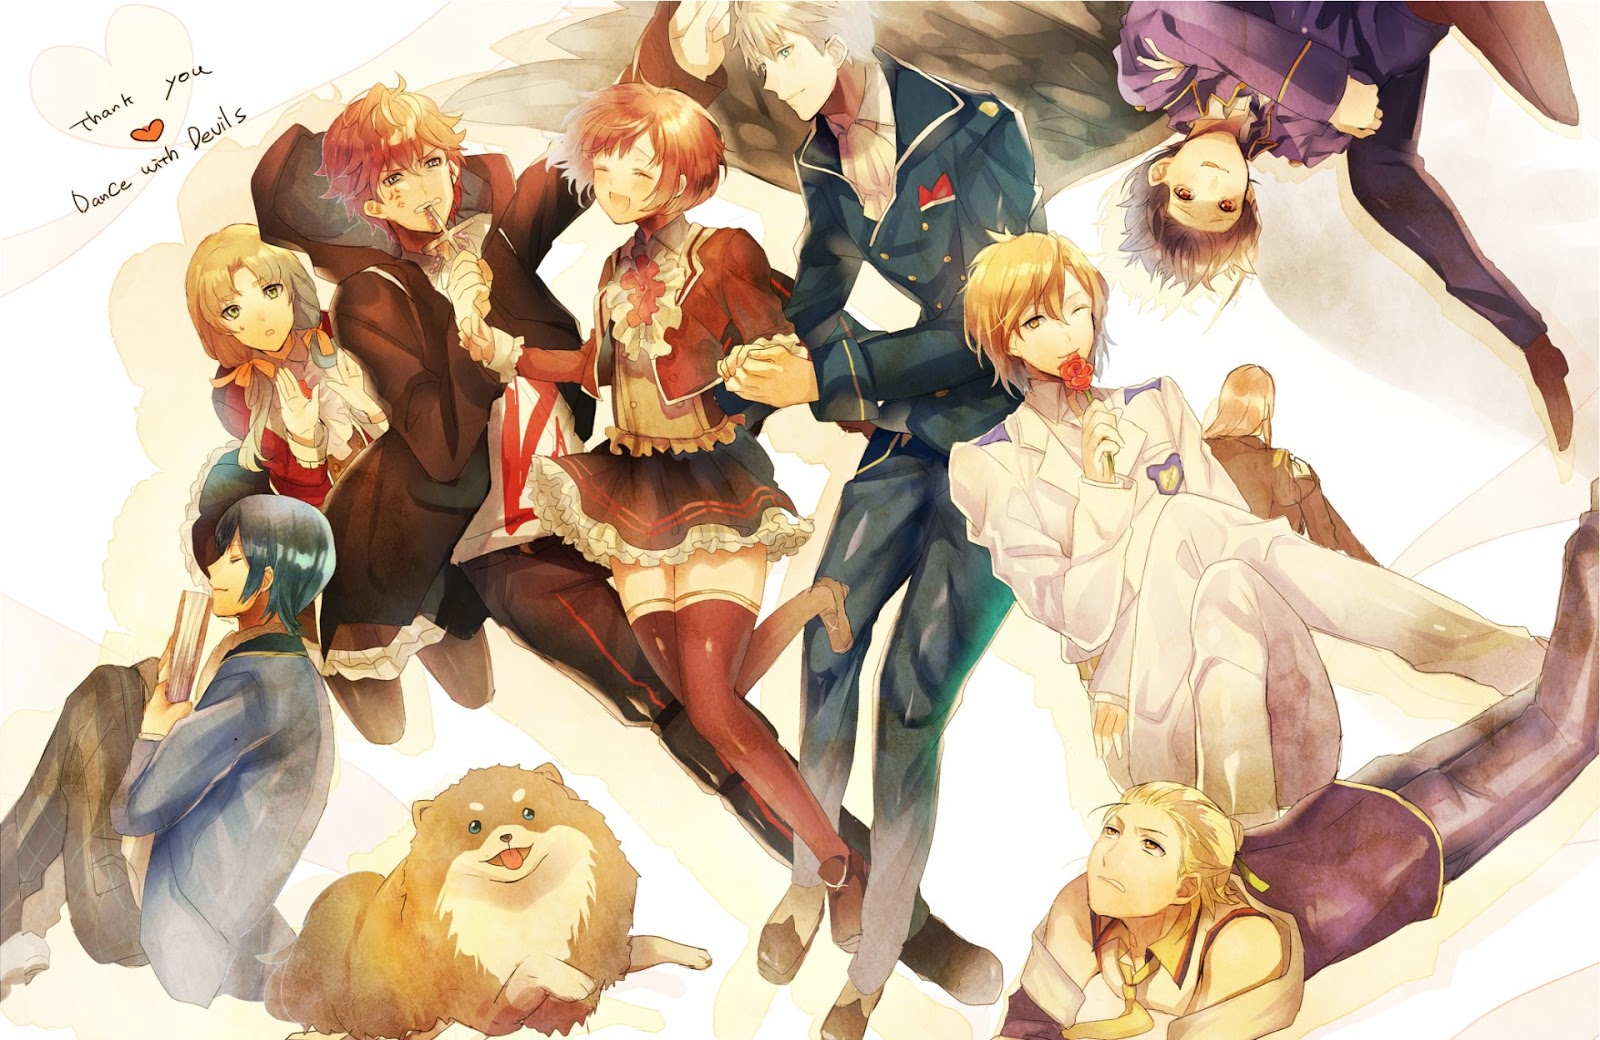 Best Harem Anime 2020.Top 7 Reverse Harem Anime Updated 2019 Version Misaka S